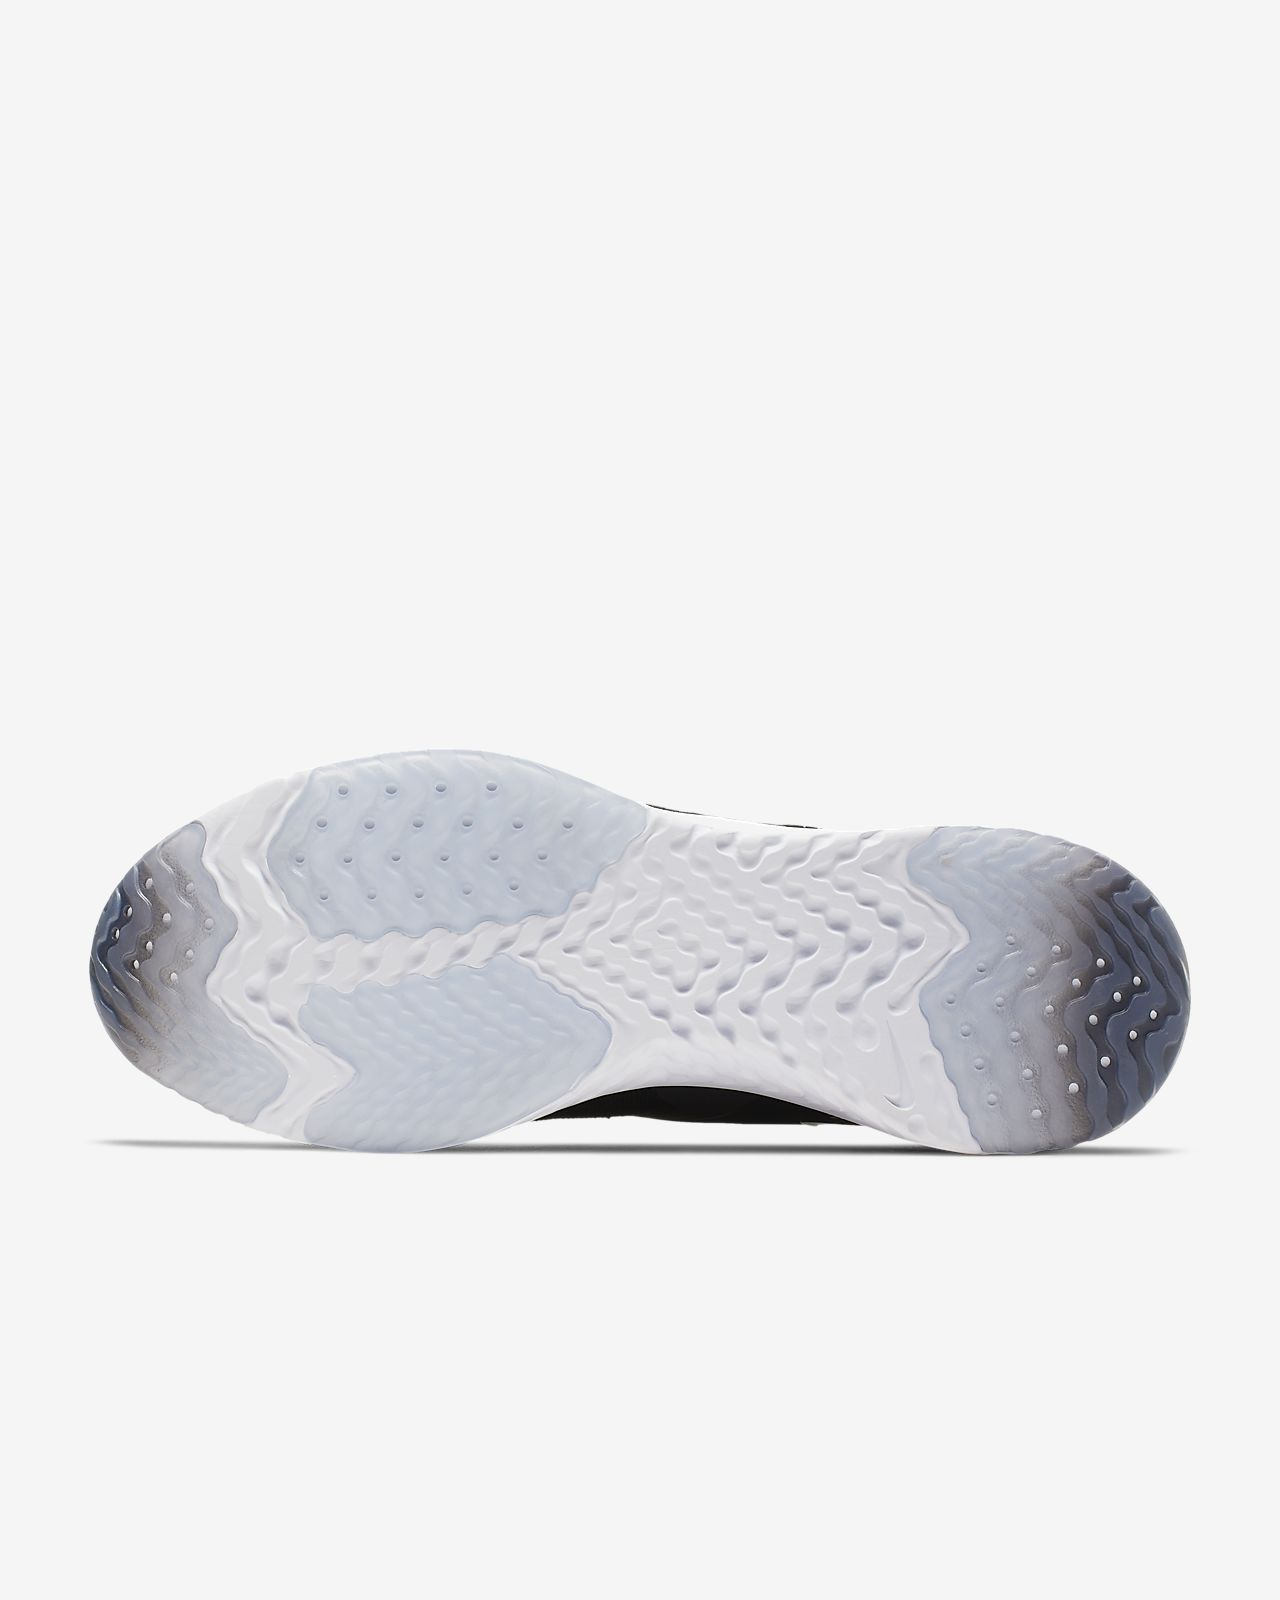 Da Uomo React Odyssey Scarpa Nike 2 Flyknit Grafica Con Rcoxedb Running mN80yvnOw